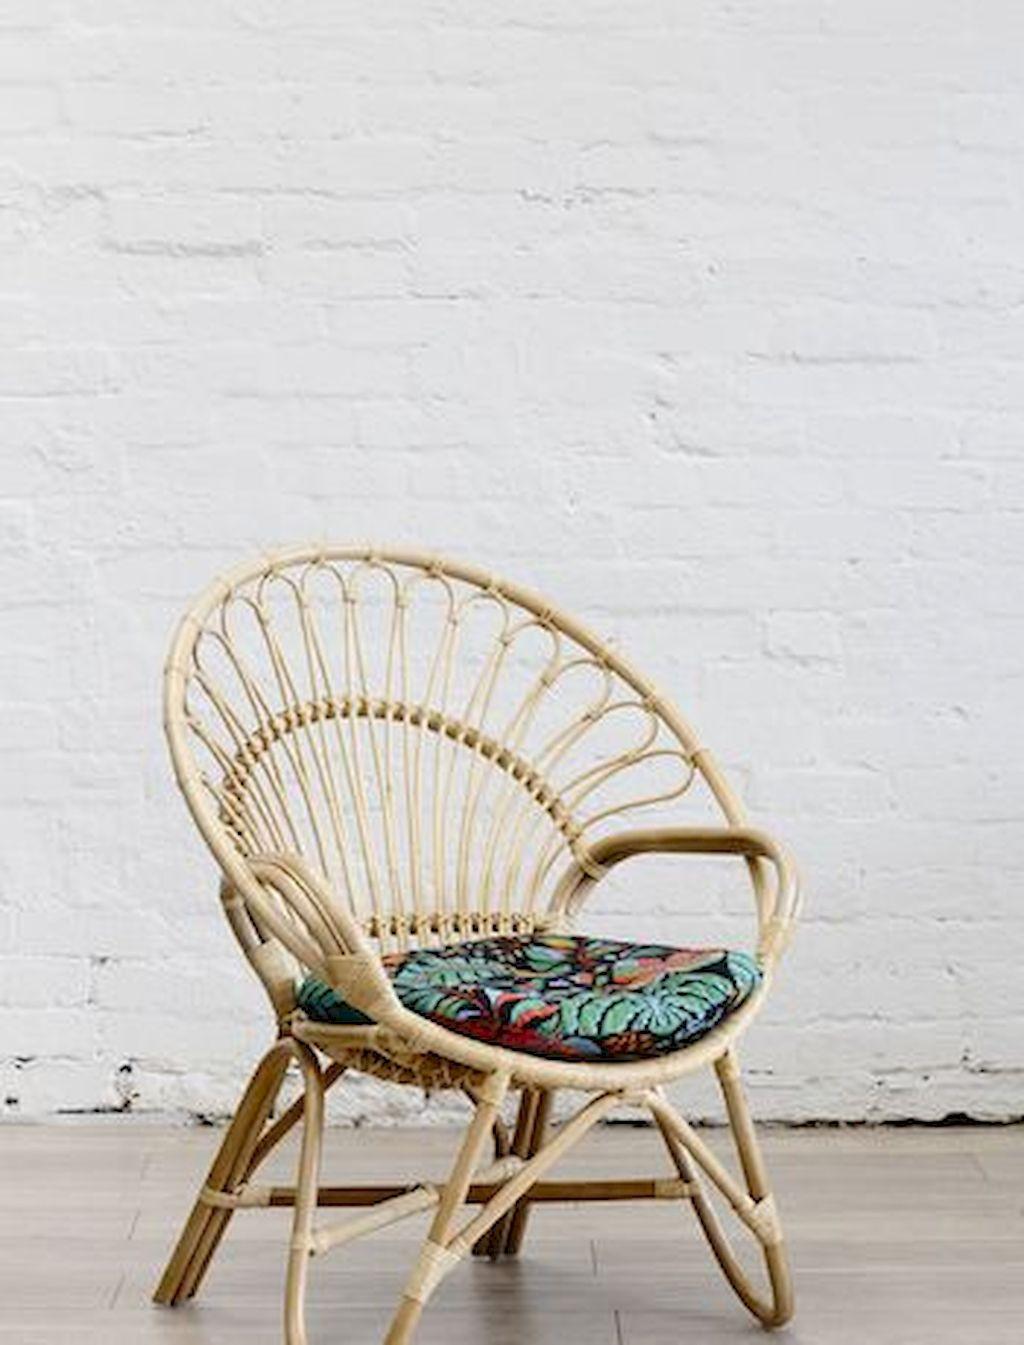 Rattan Furniture069